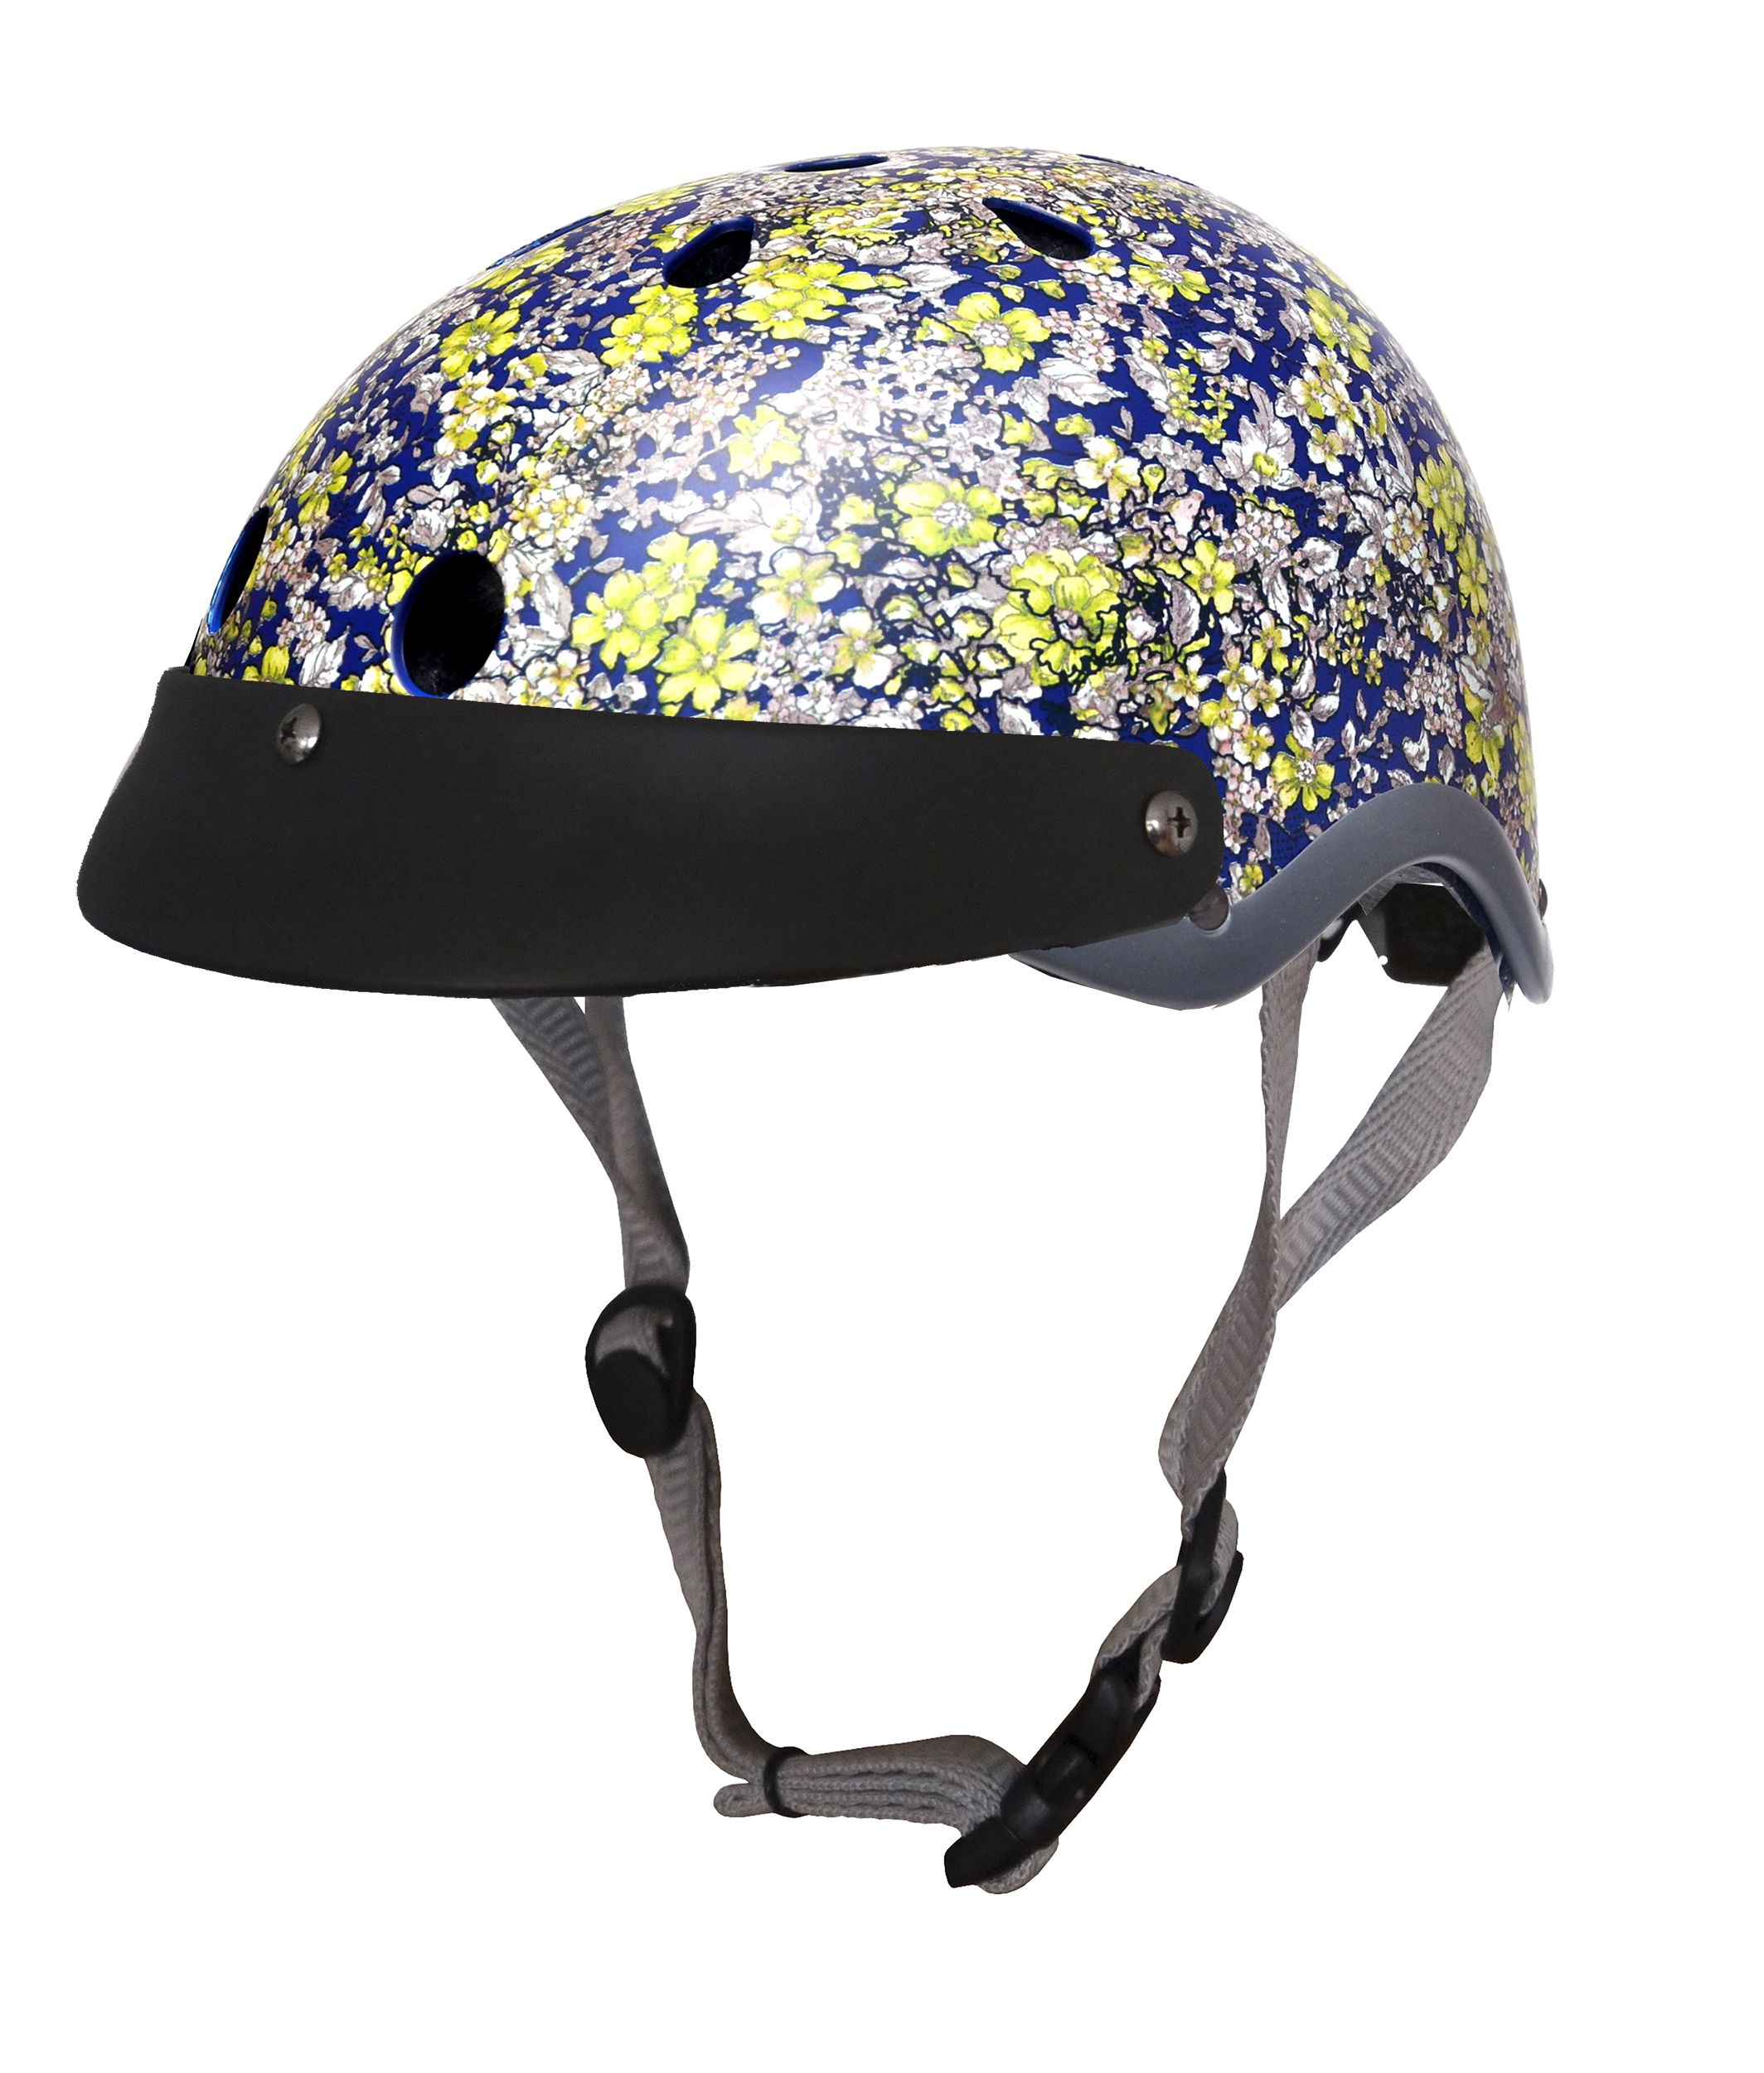 Sawako Furuno Floral Midnight Blue Helmet Bald With Elegance